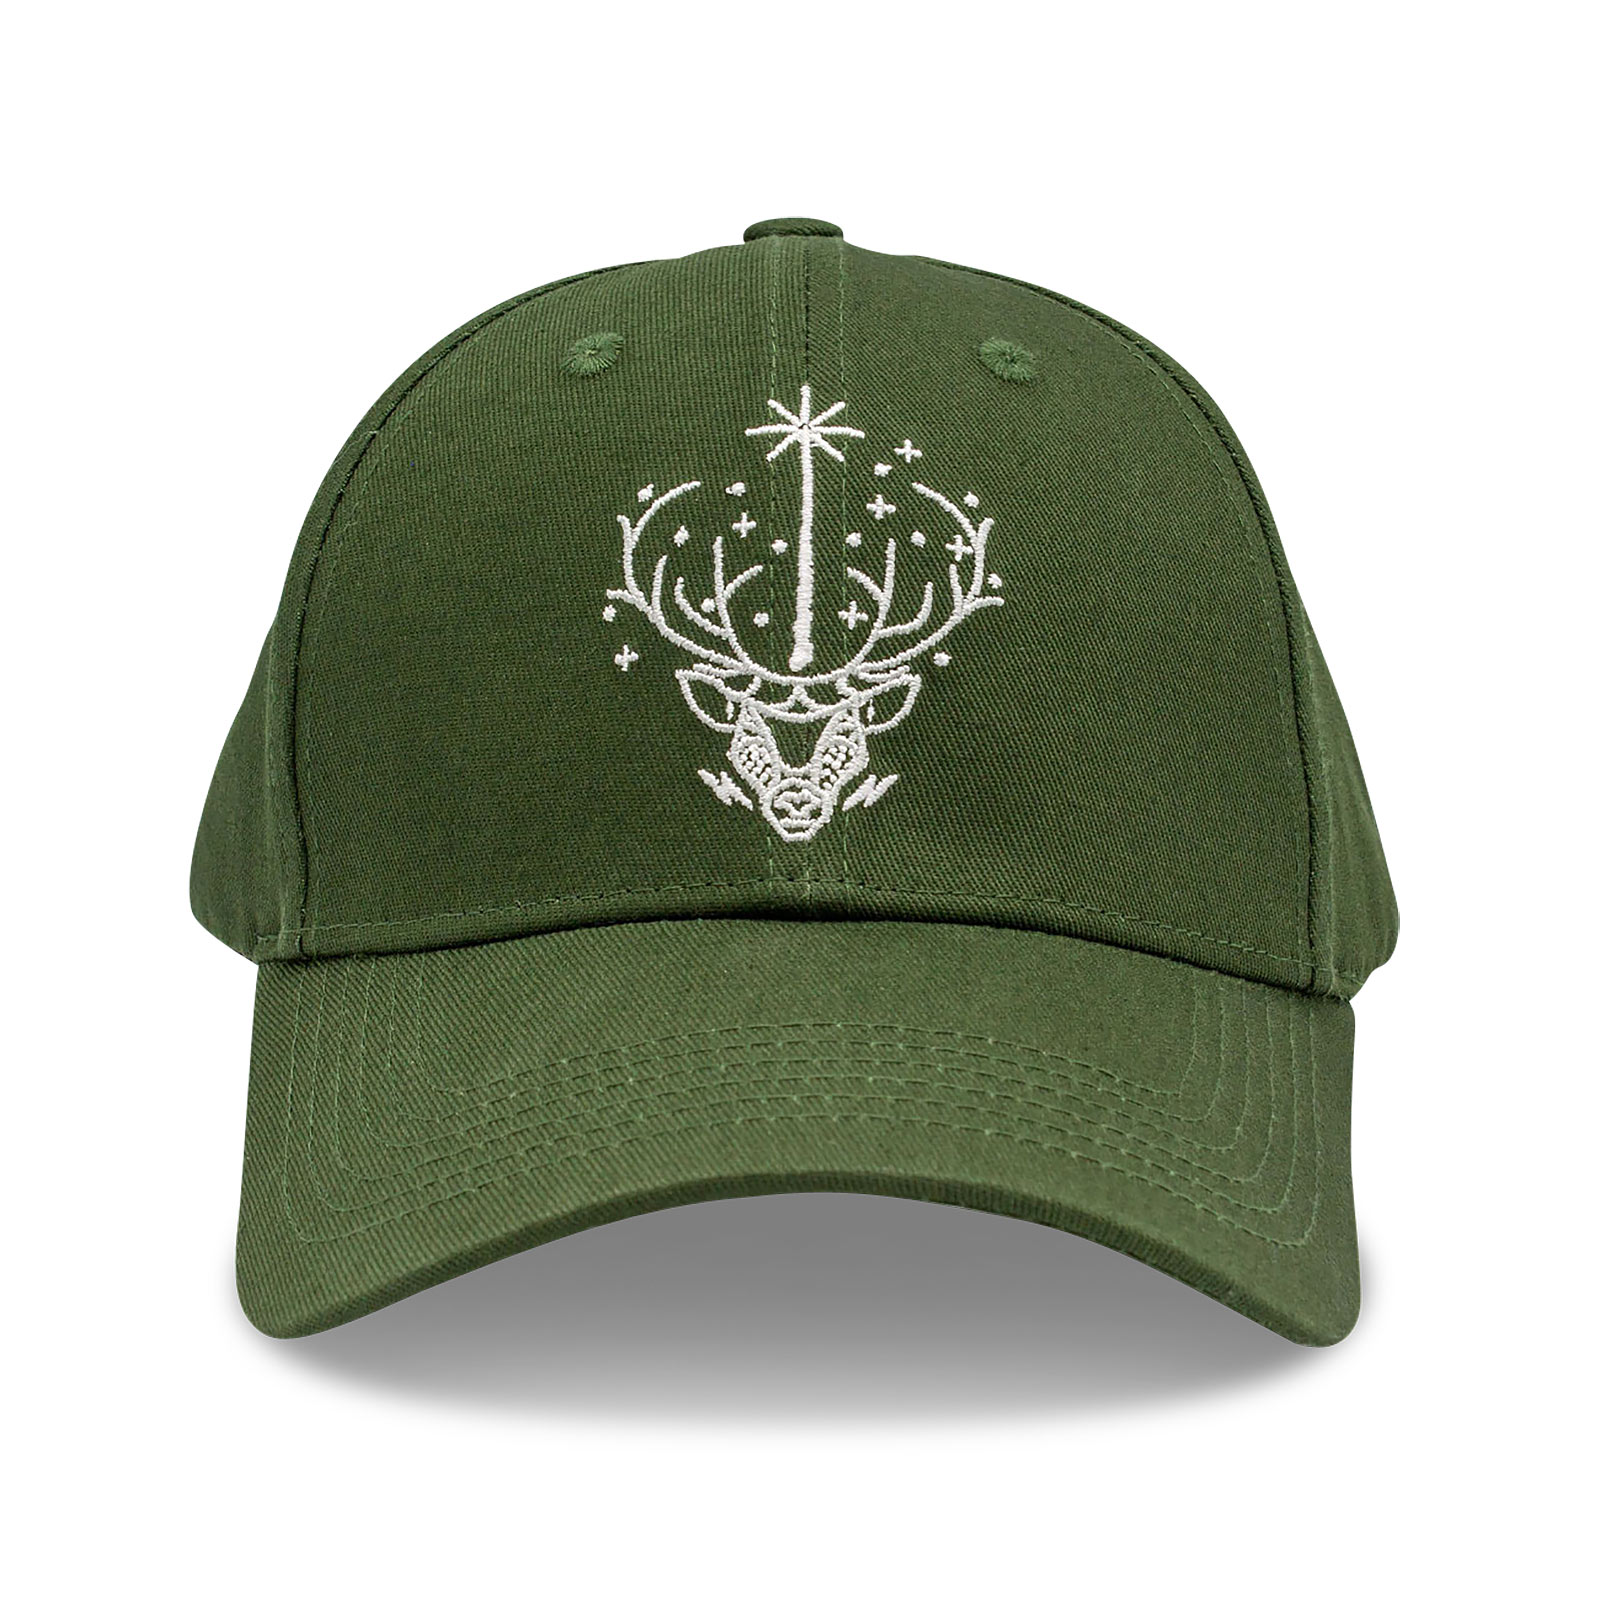 Harry Potter - Expecto Patronum Basecap grün